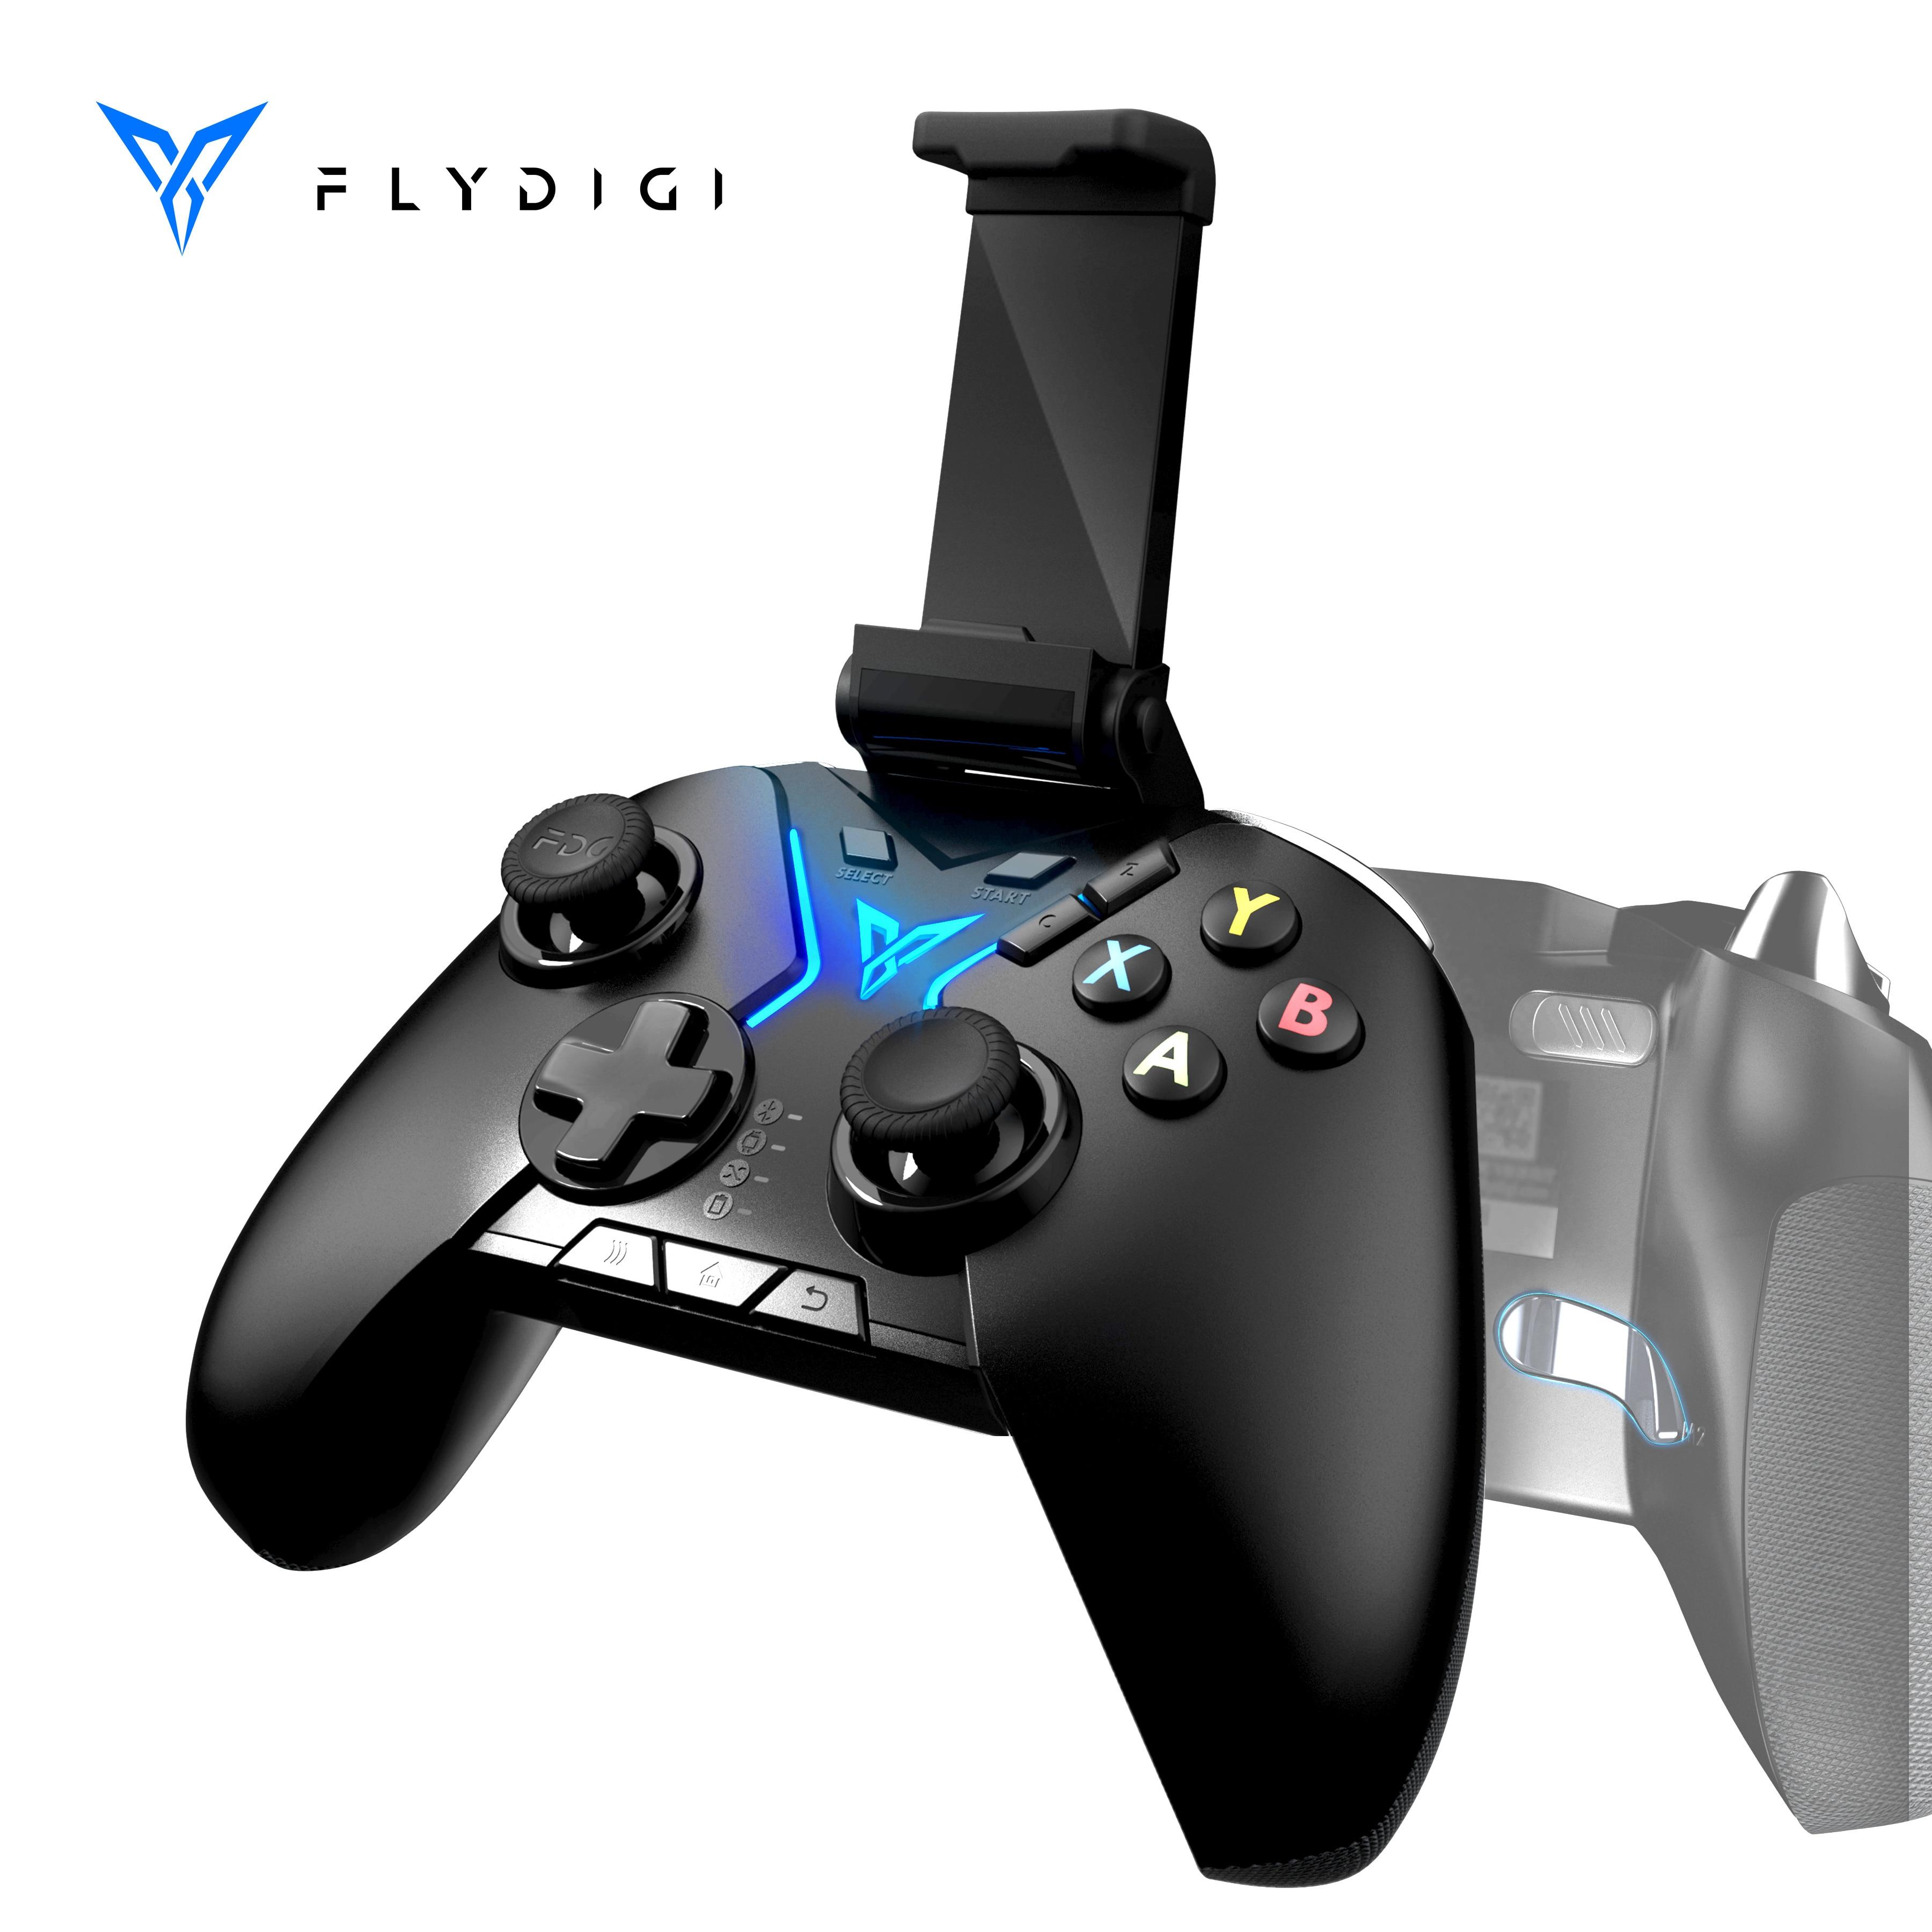 Flydigi-controlador Apex Esports Bluetooth pubg para videojuegos, inalámbrico, con soporte para teléfono, mando para PC, almohadilla para teléfono móvil